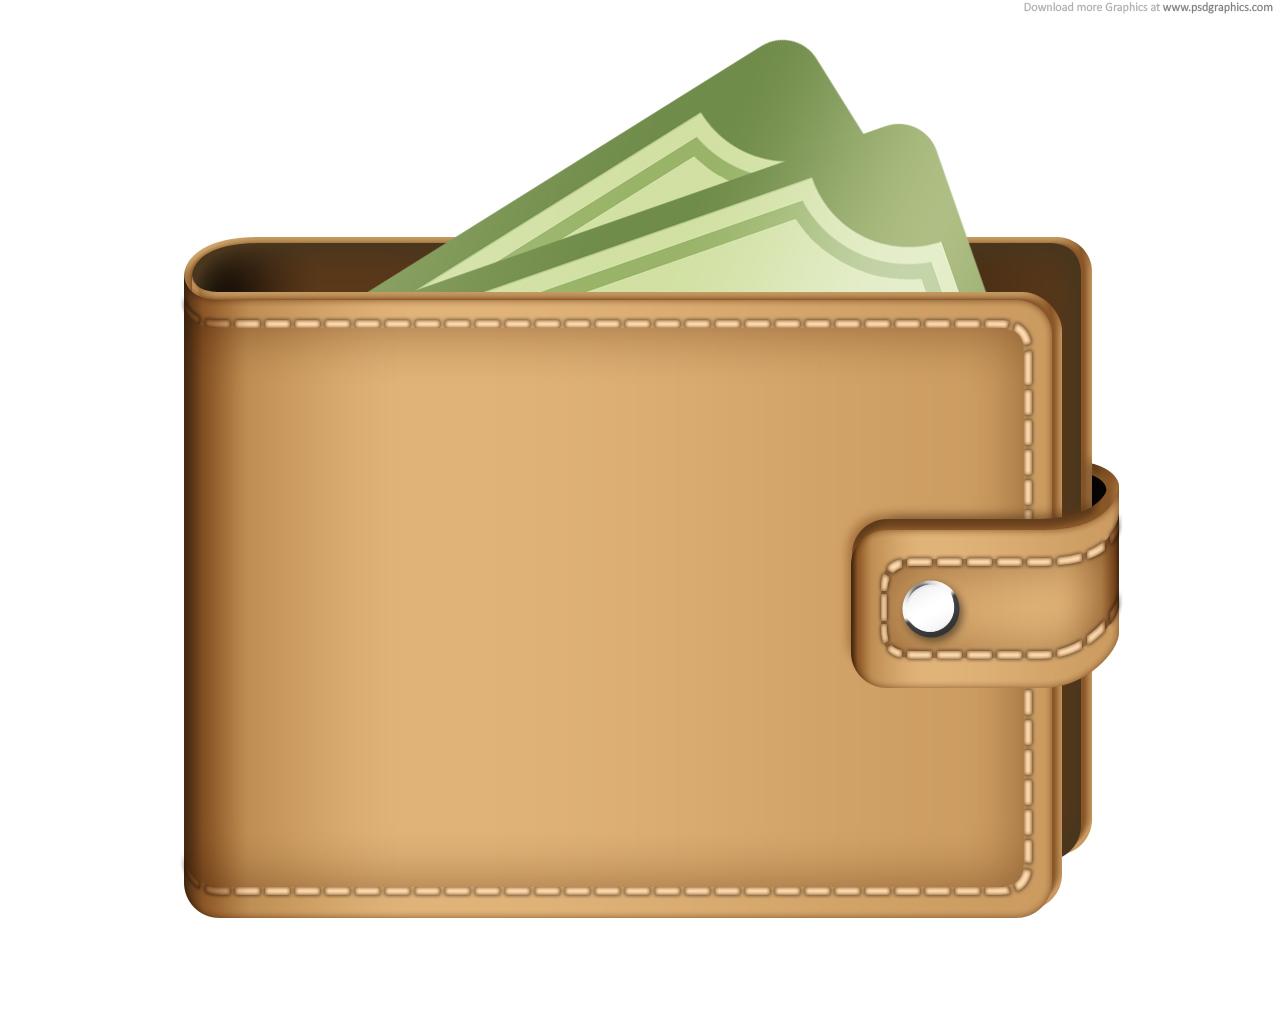 Wallet PNG - 2296